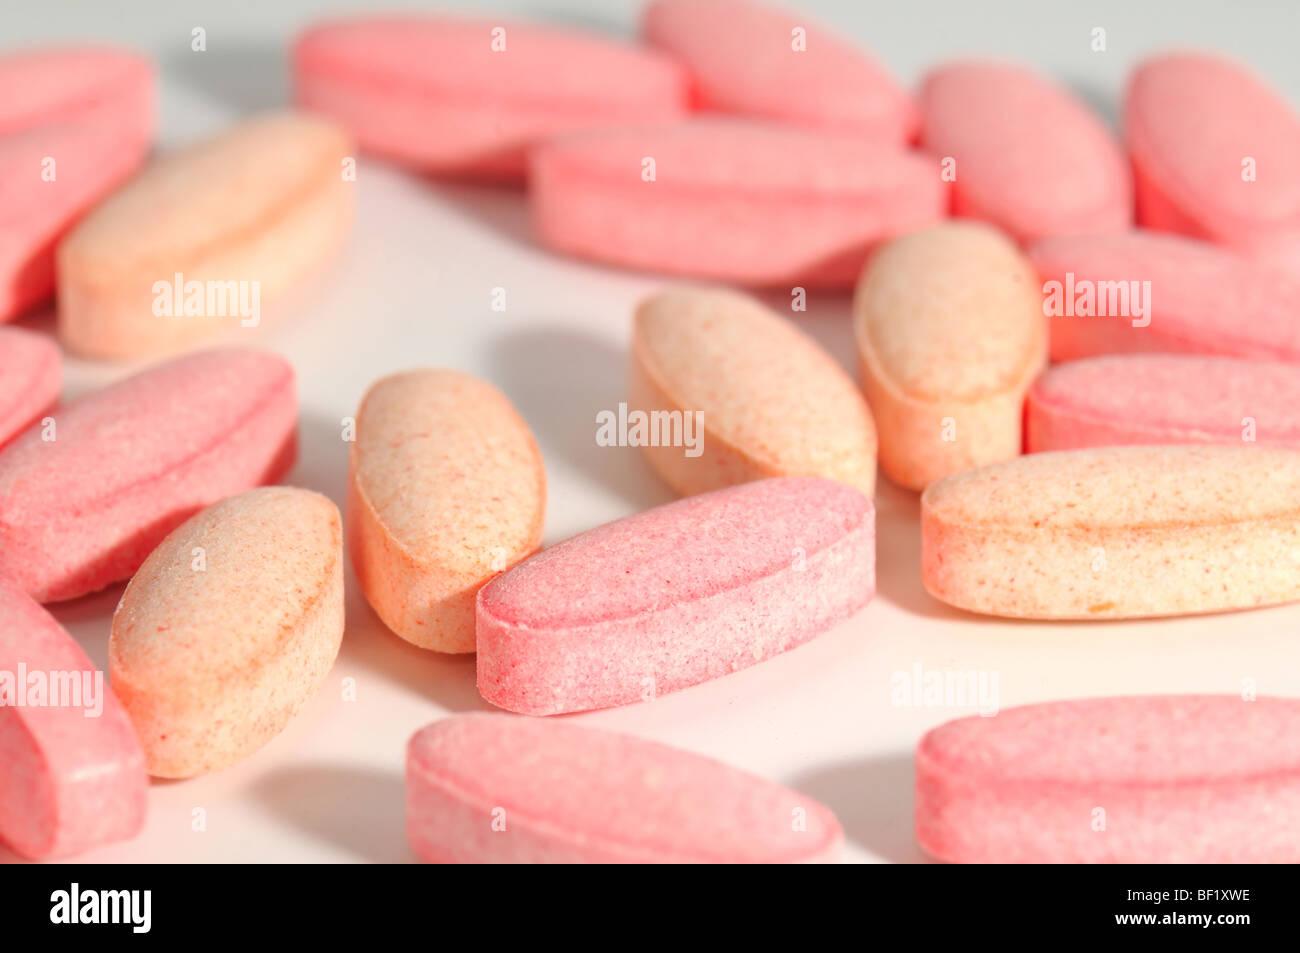 blue pills on white background stock photos amp blue pills